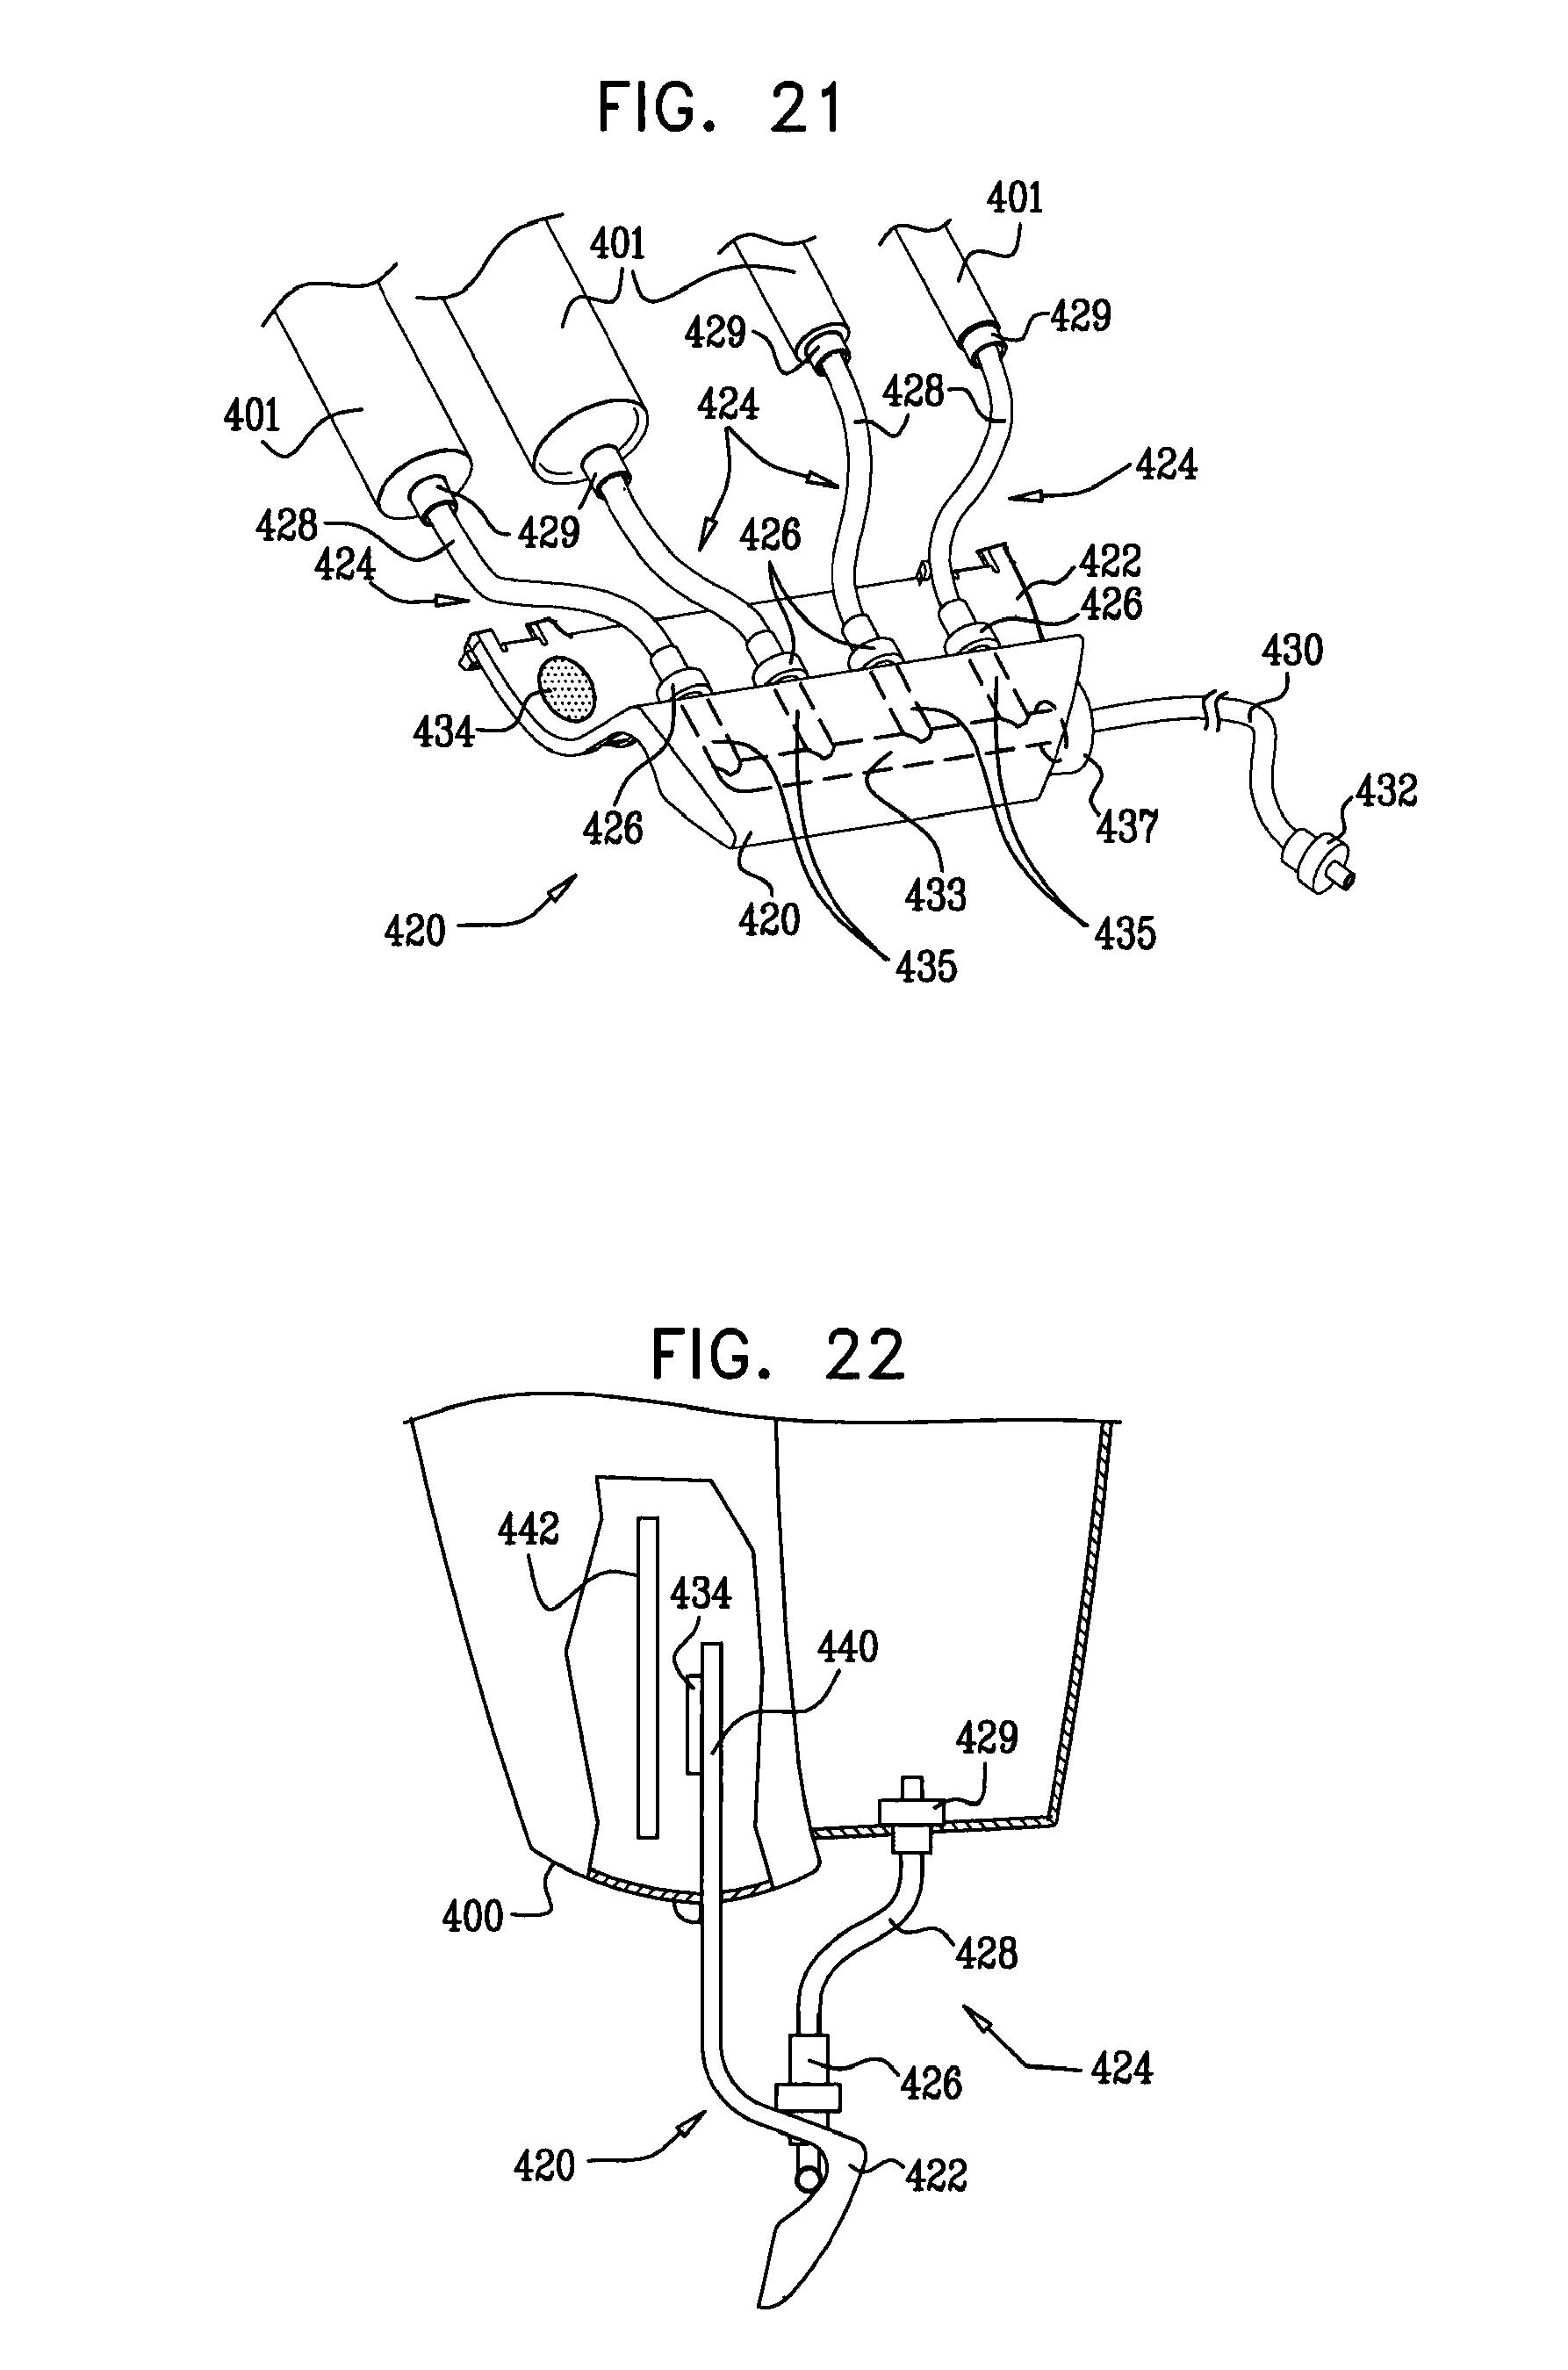 Patent US 8,615,405 B2